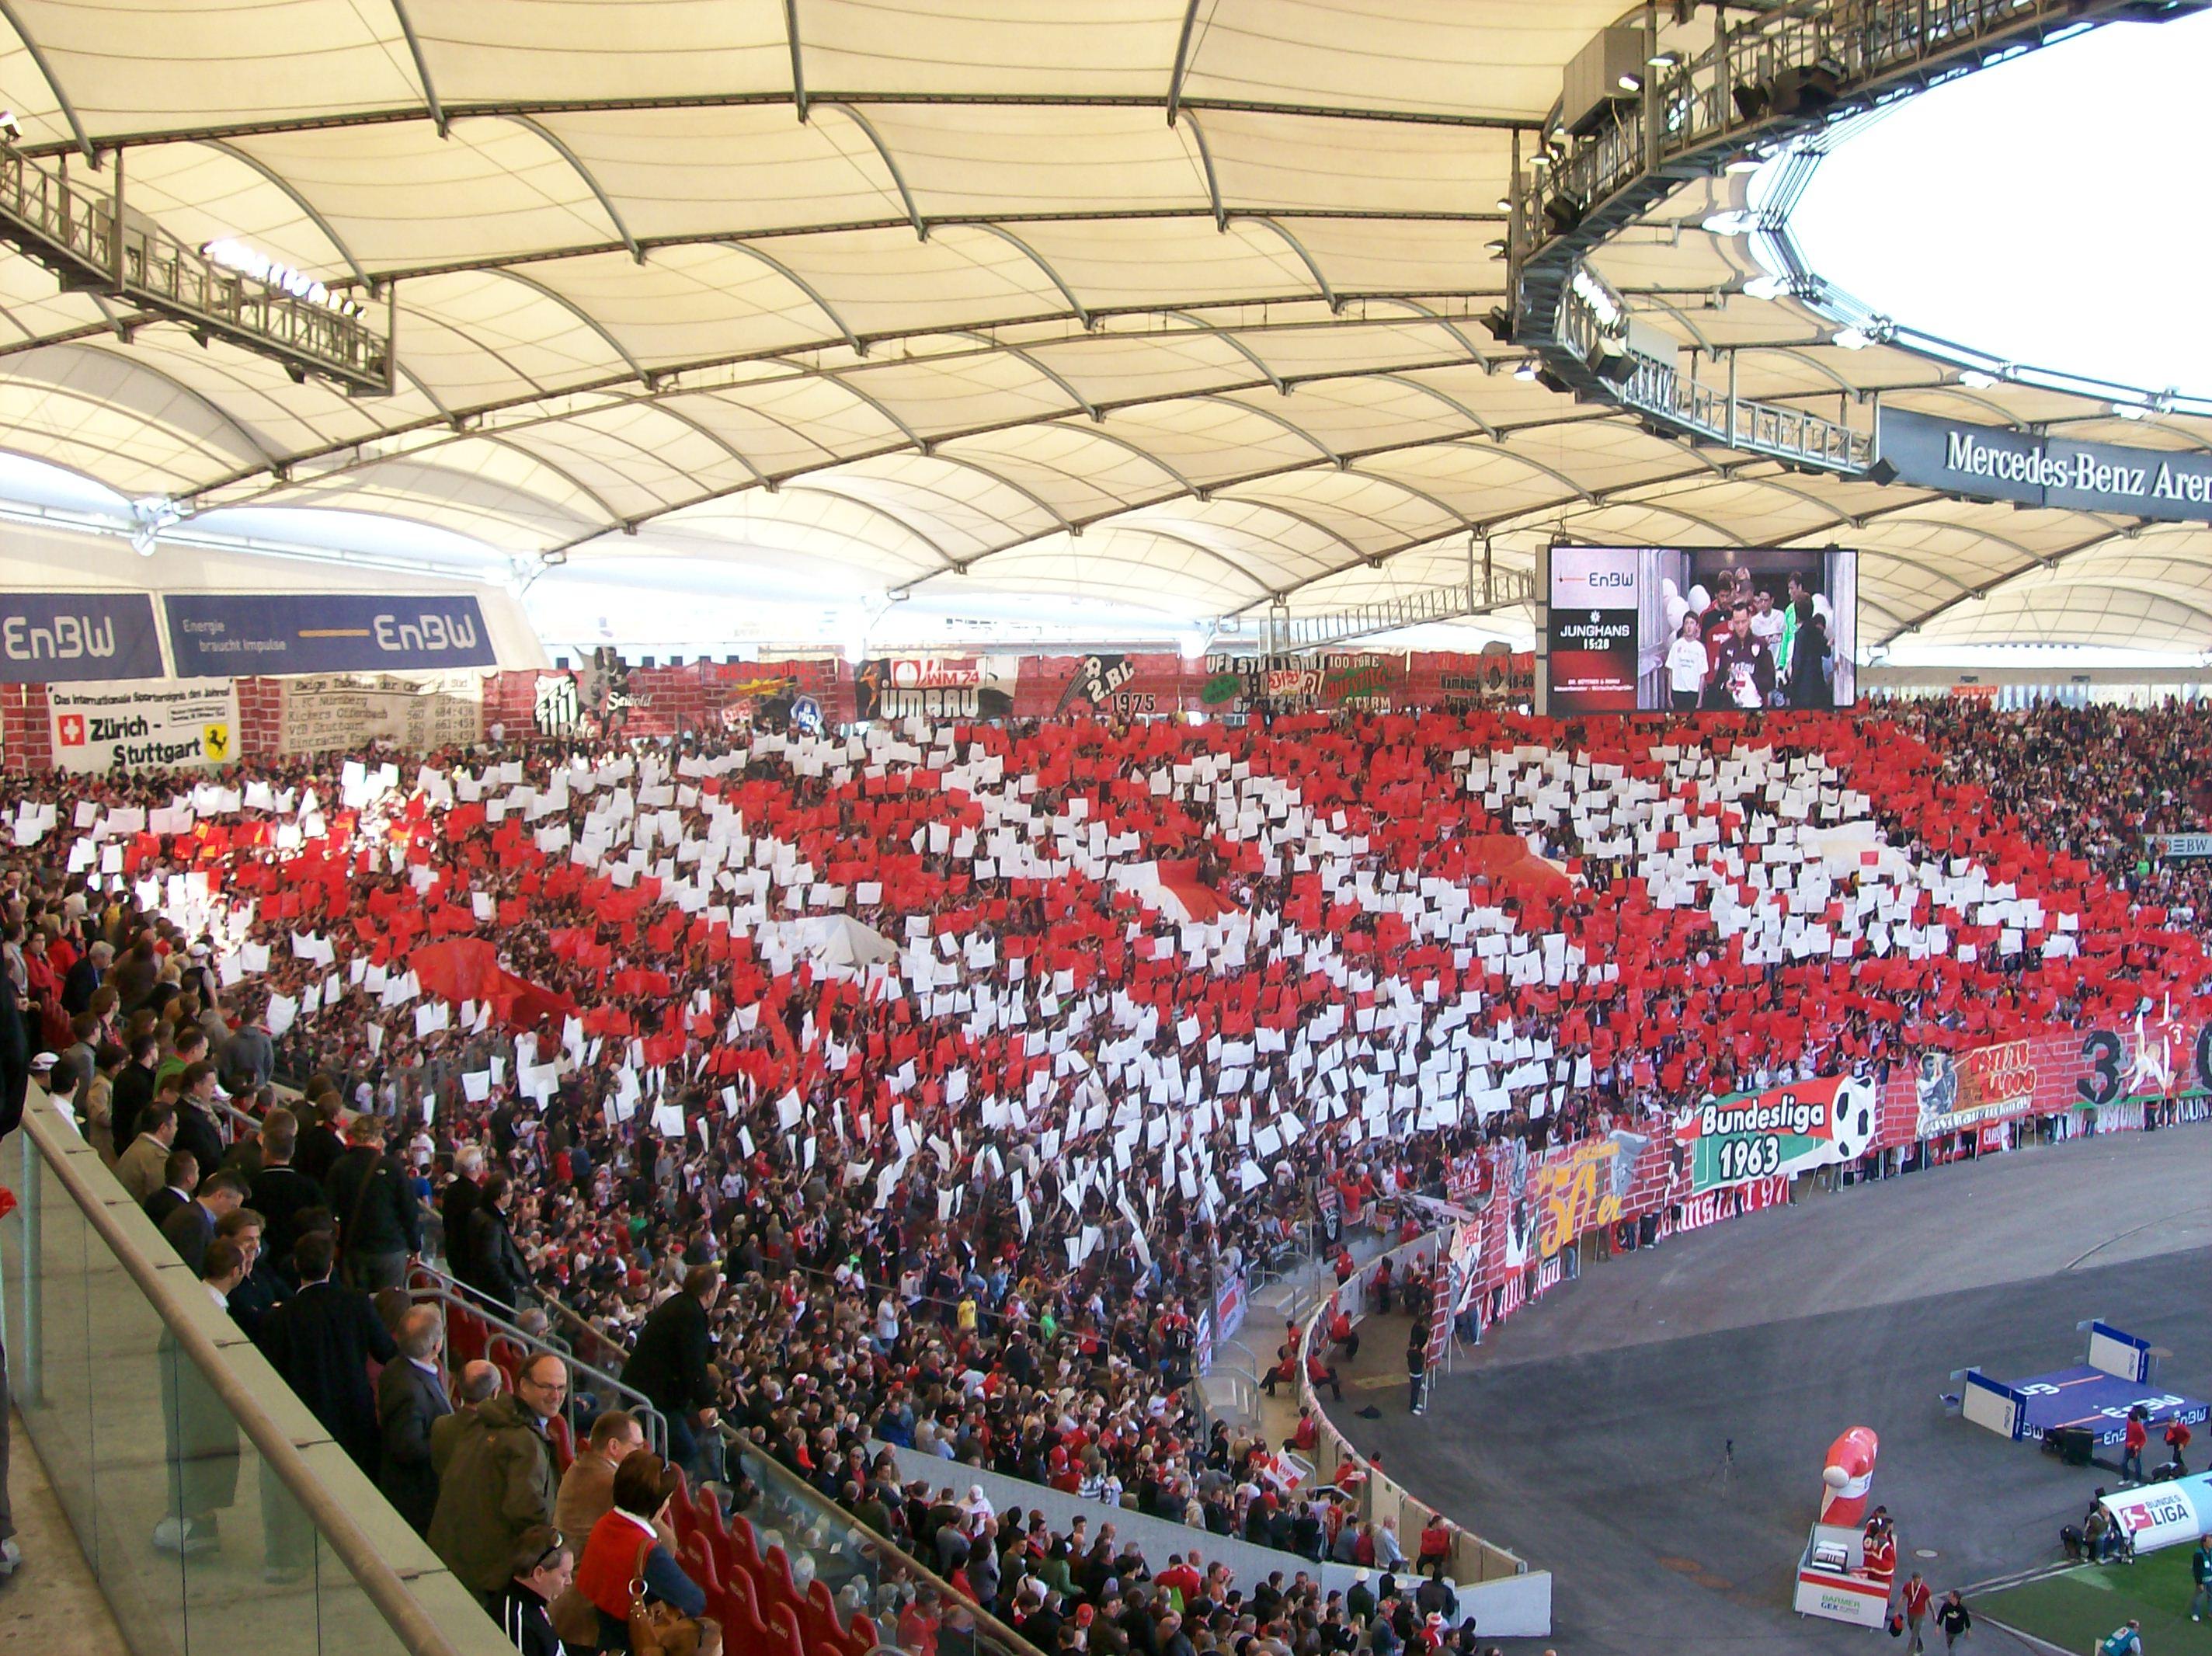 Fans in der mercedes benz arena al amine for Mercedes benz fans